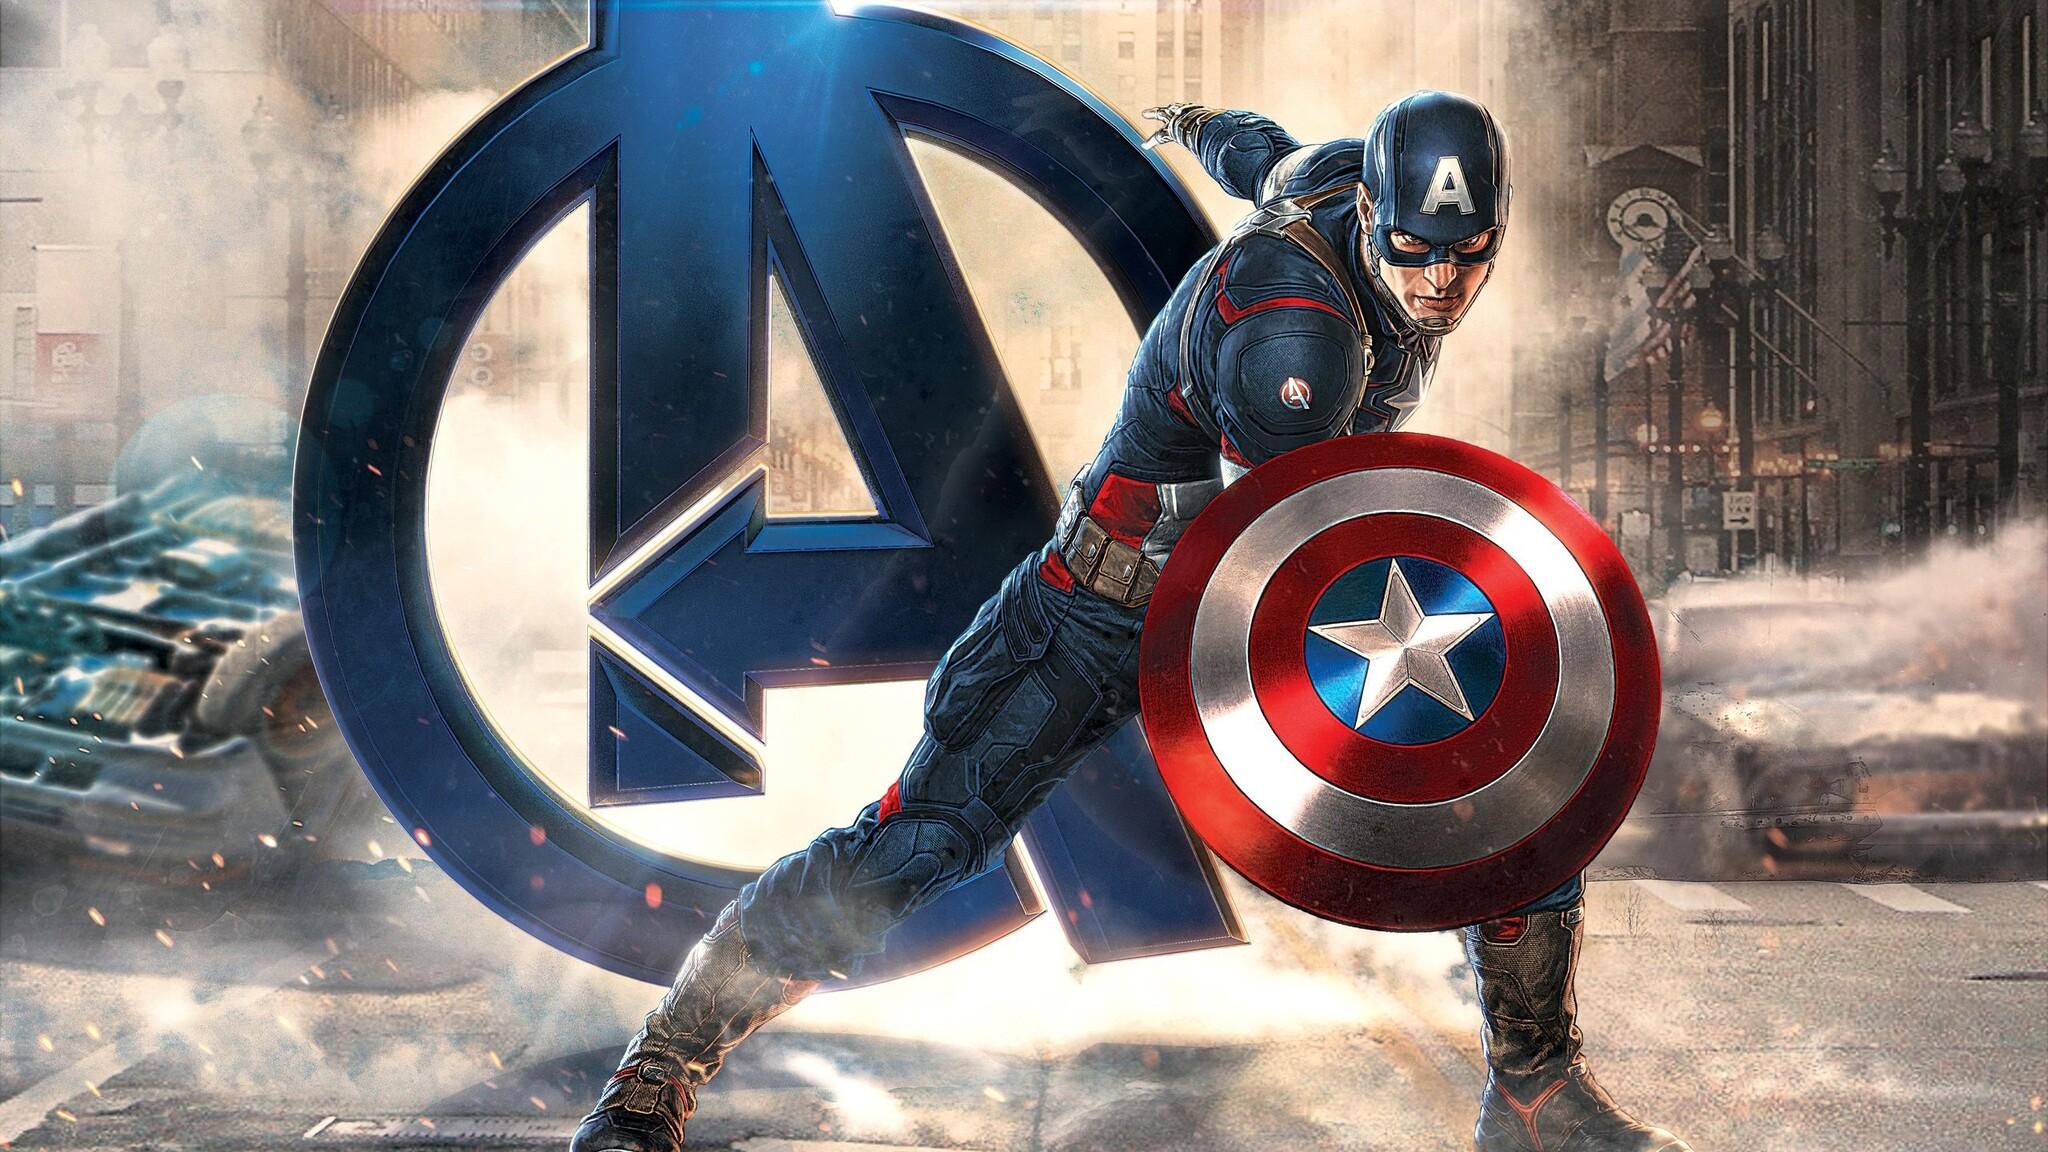 2048x1152 captain america avengers 2048x1152 resolution hd